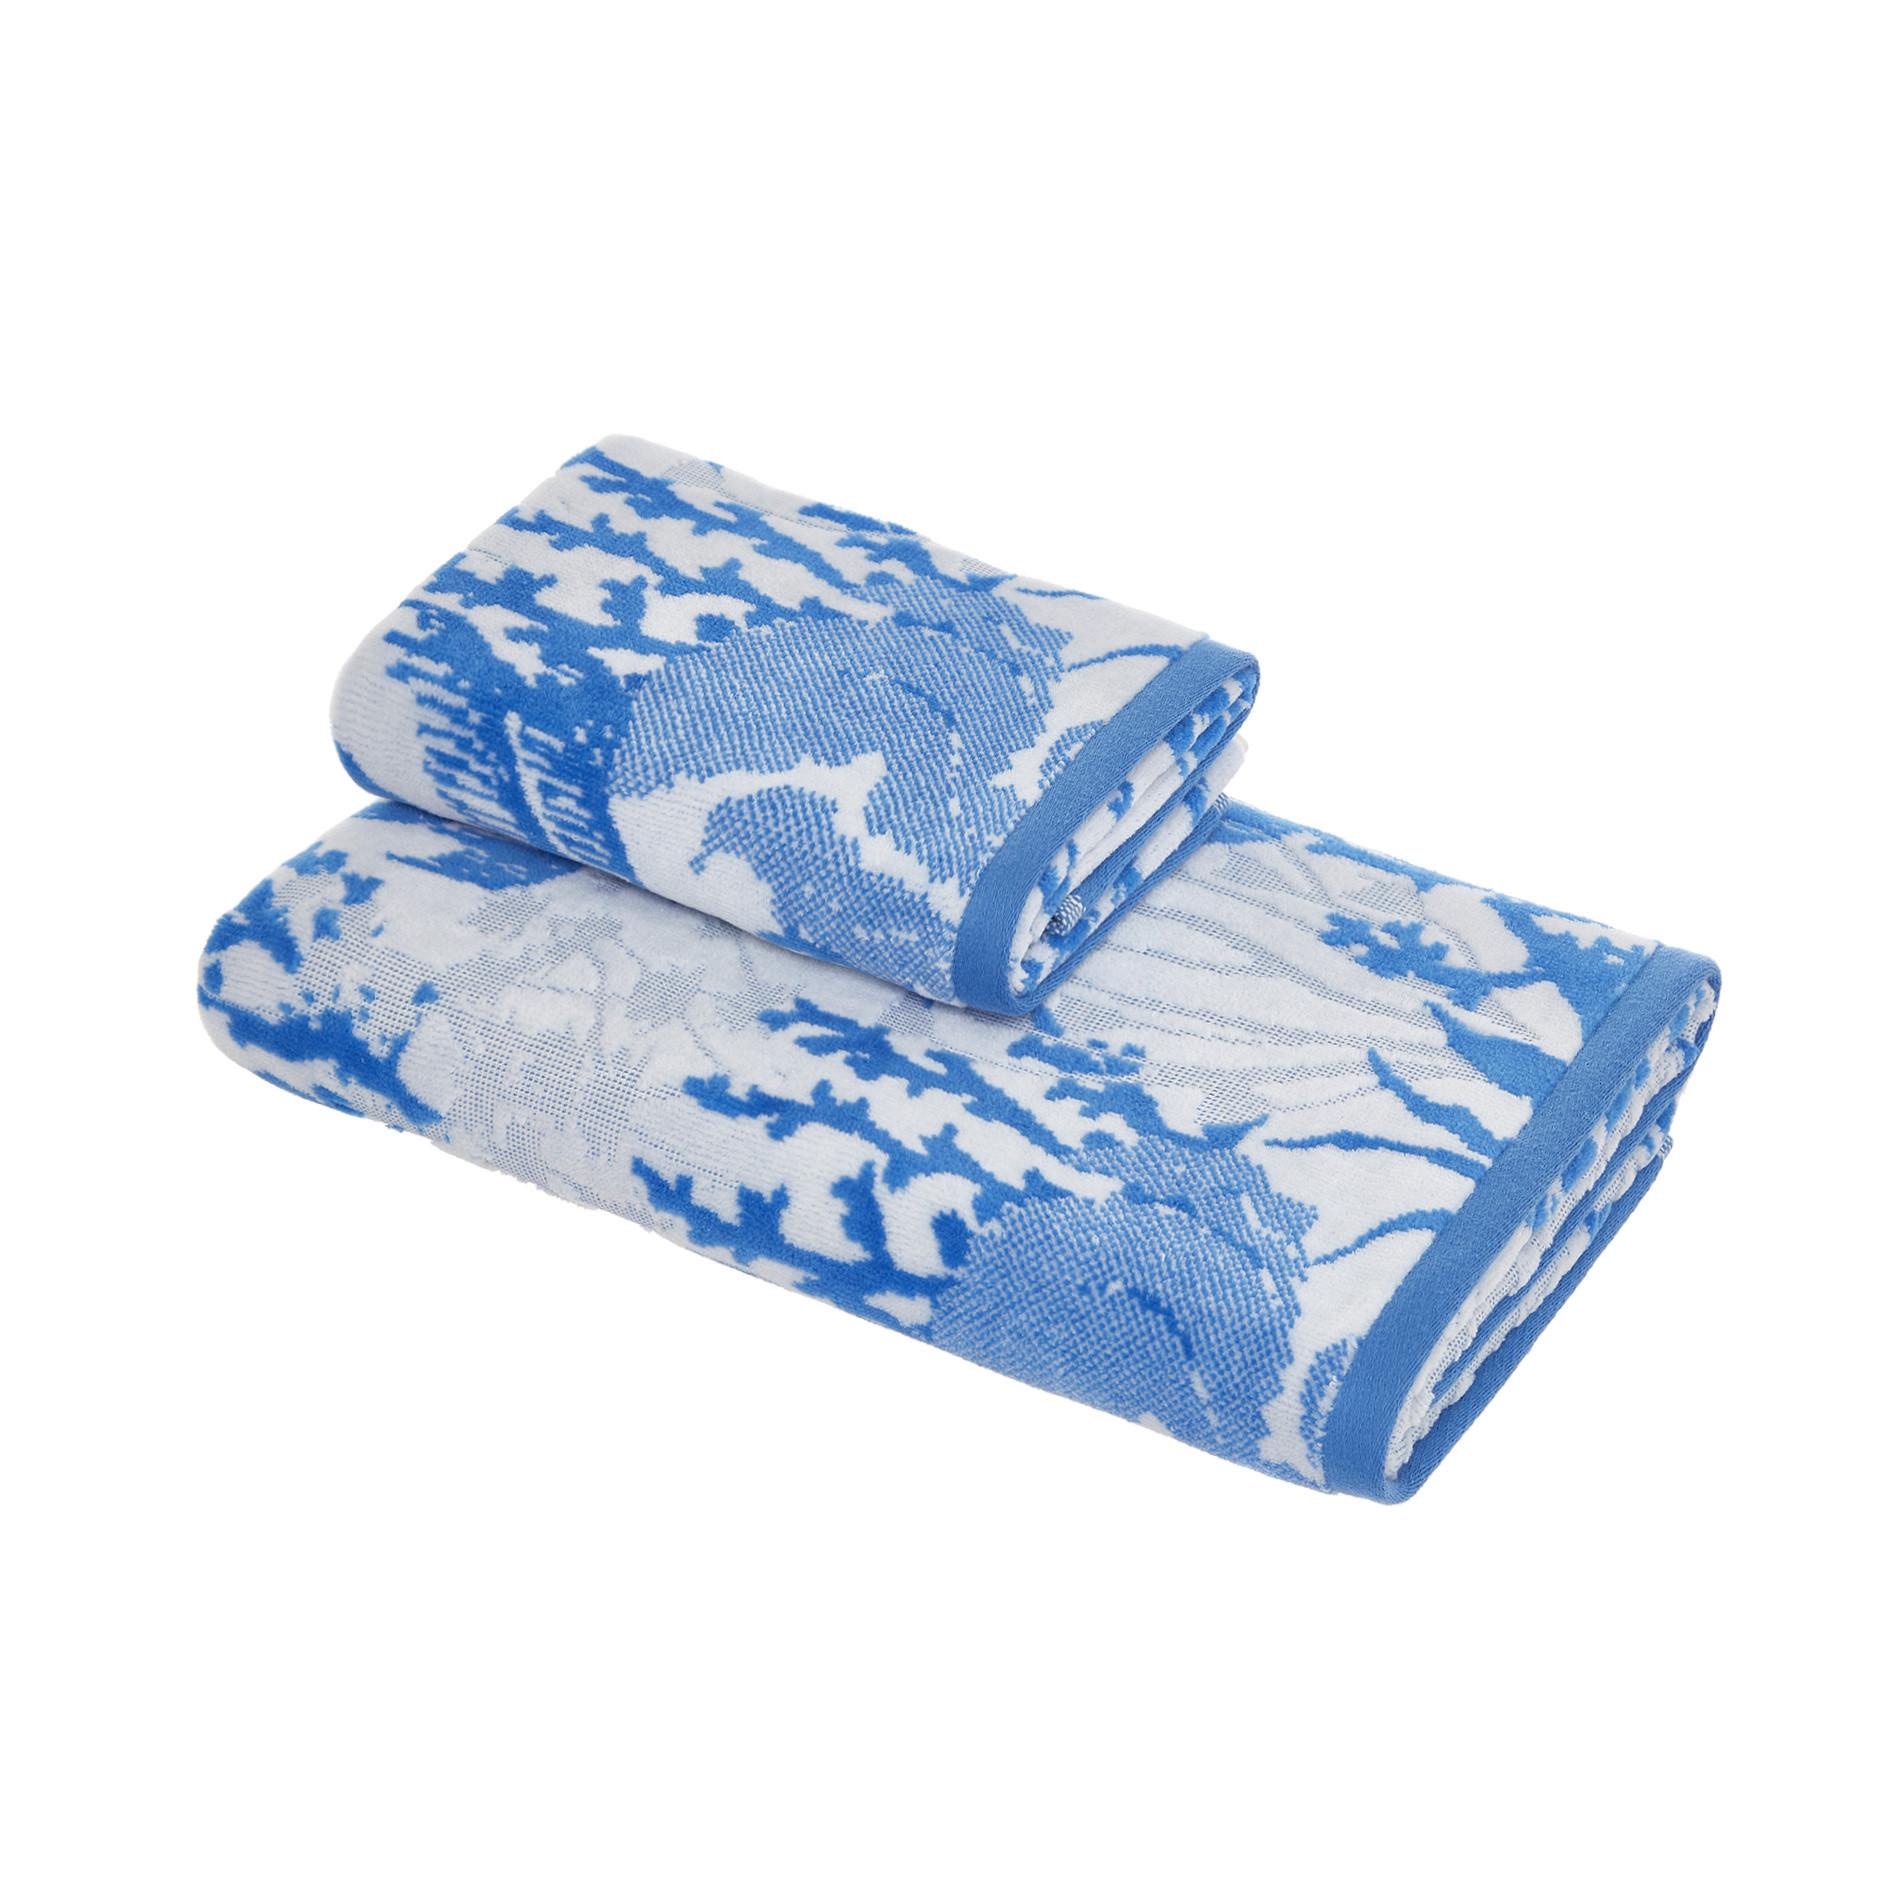 Asciugamano cotone velour motivo coralli, Blu, large image number 0